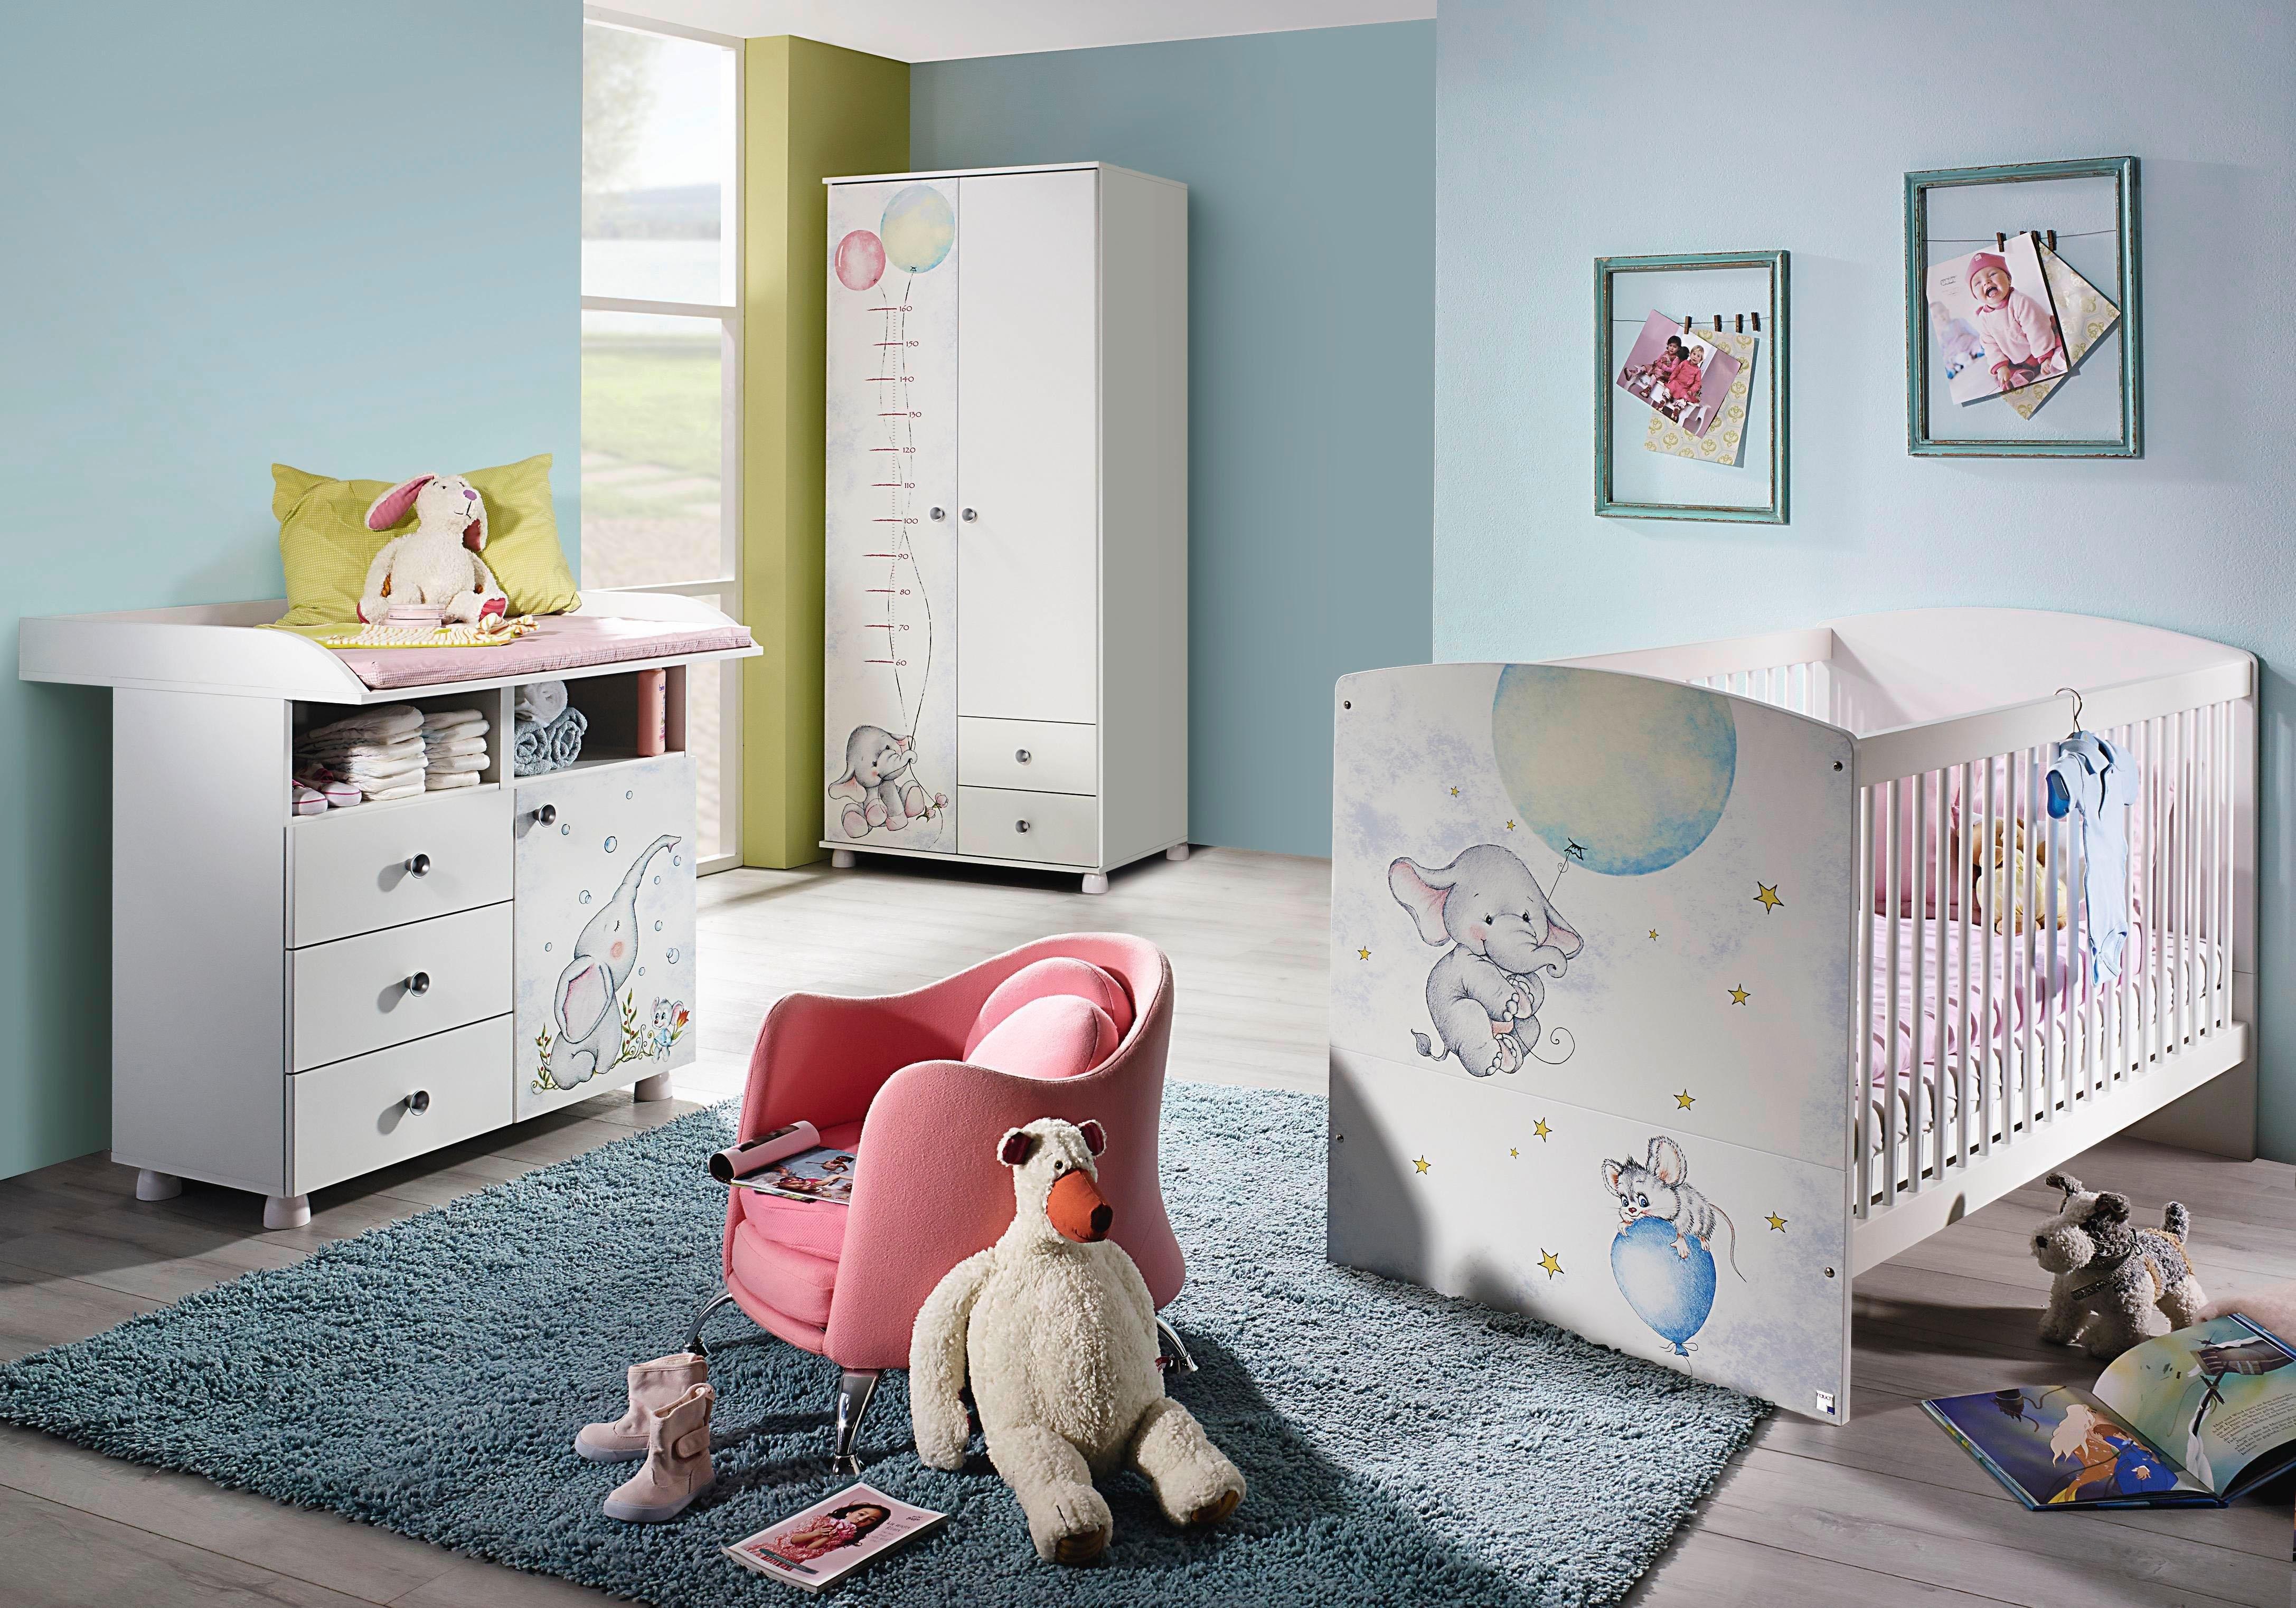 Complete Babykamer Grijs.Complete Babykamer Shoppen Nu Gratis Thuisbezorgd Otto